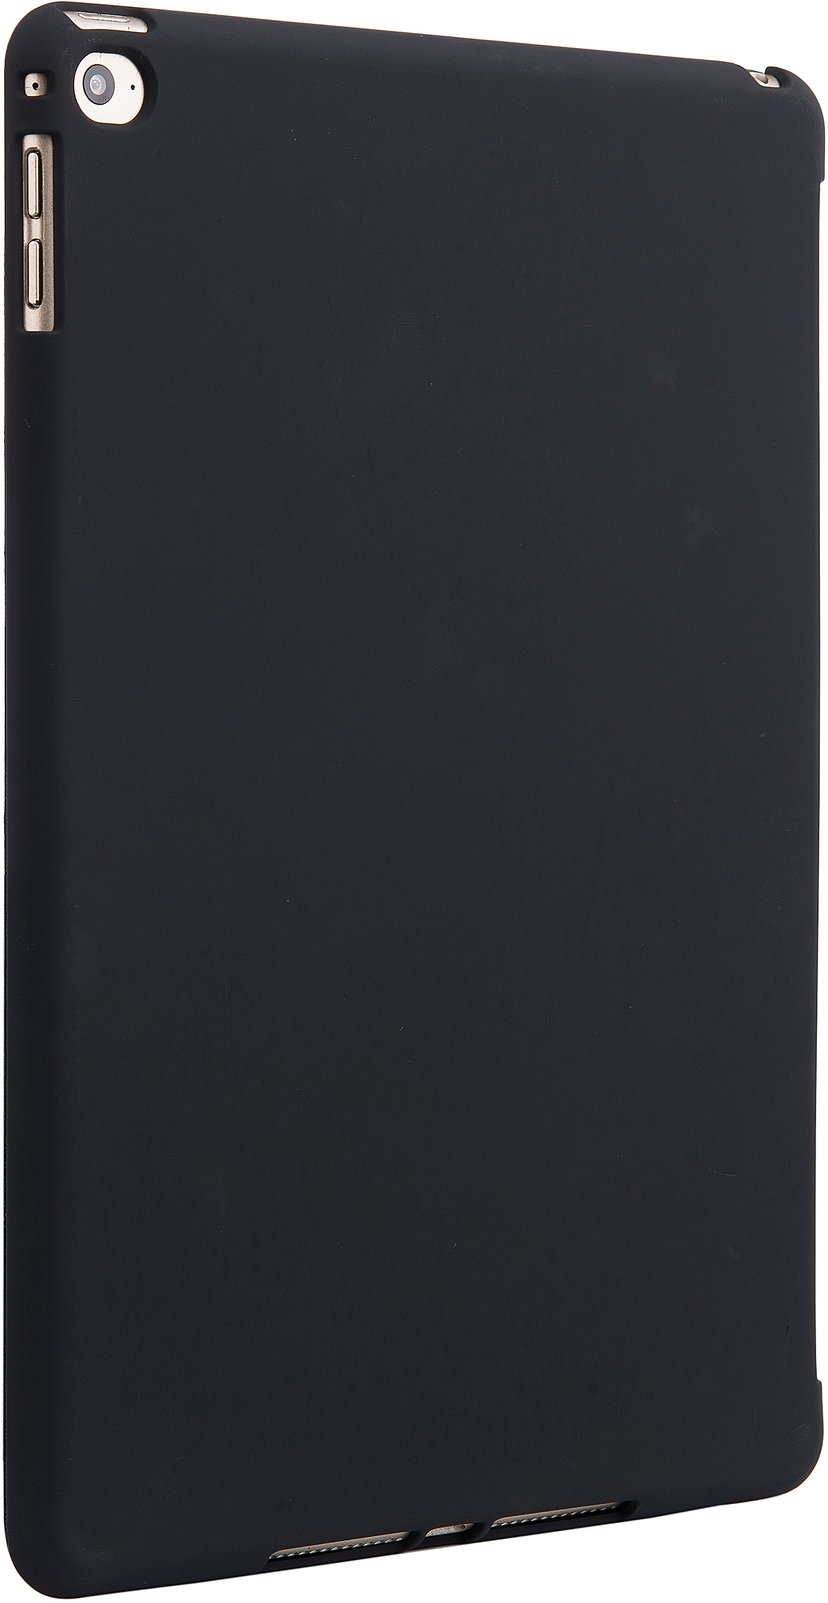 Cirafon PU Leather Covermate Plus IPad Air 2 2016 iPad Air 2 Sort